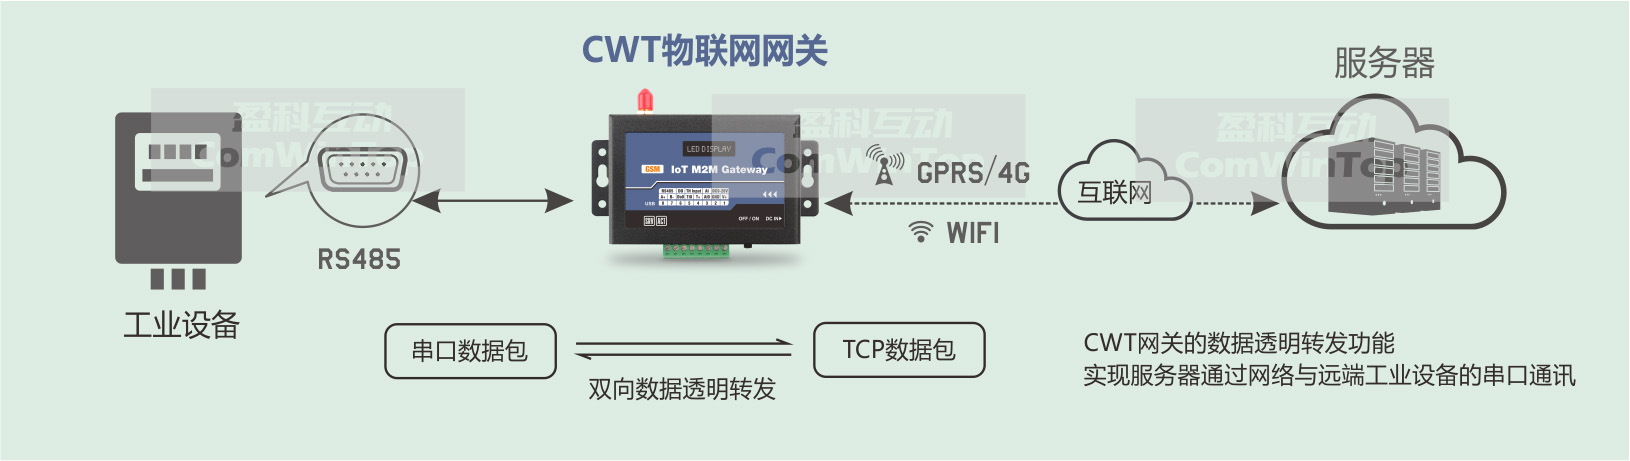 CWT-L1TH-2302